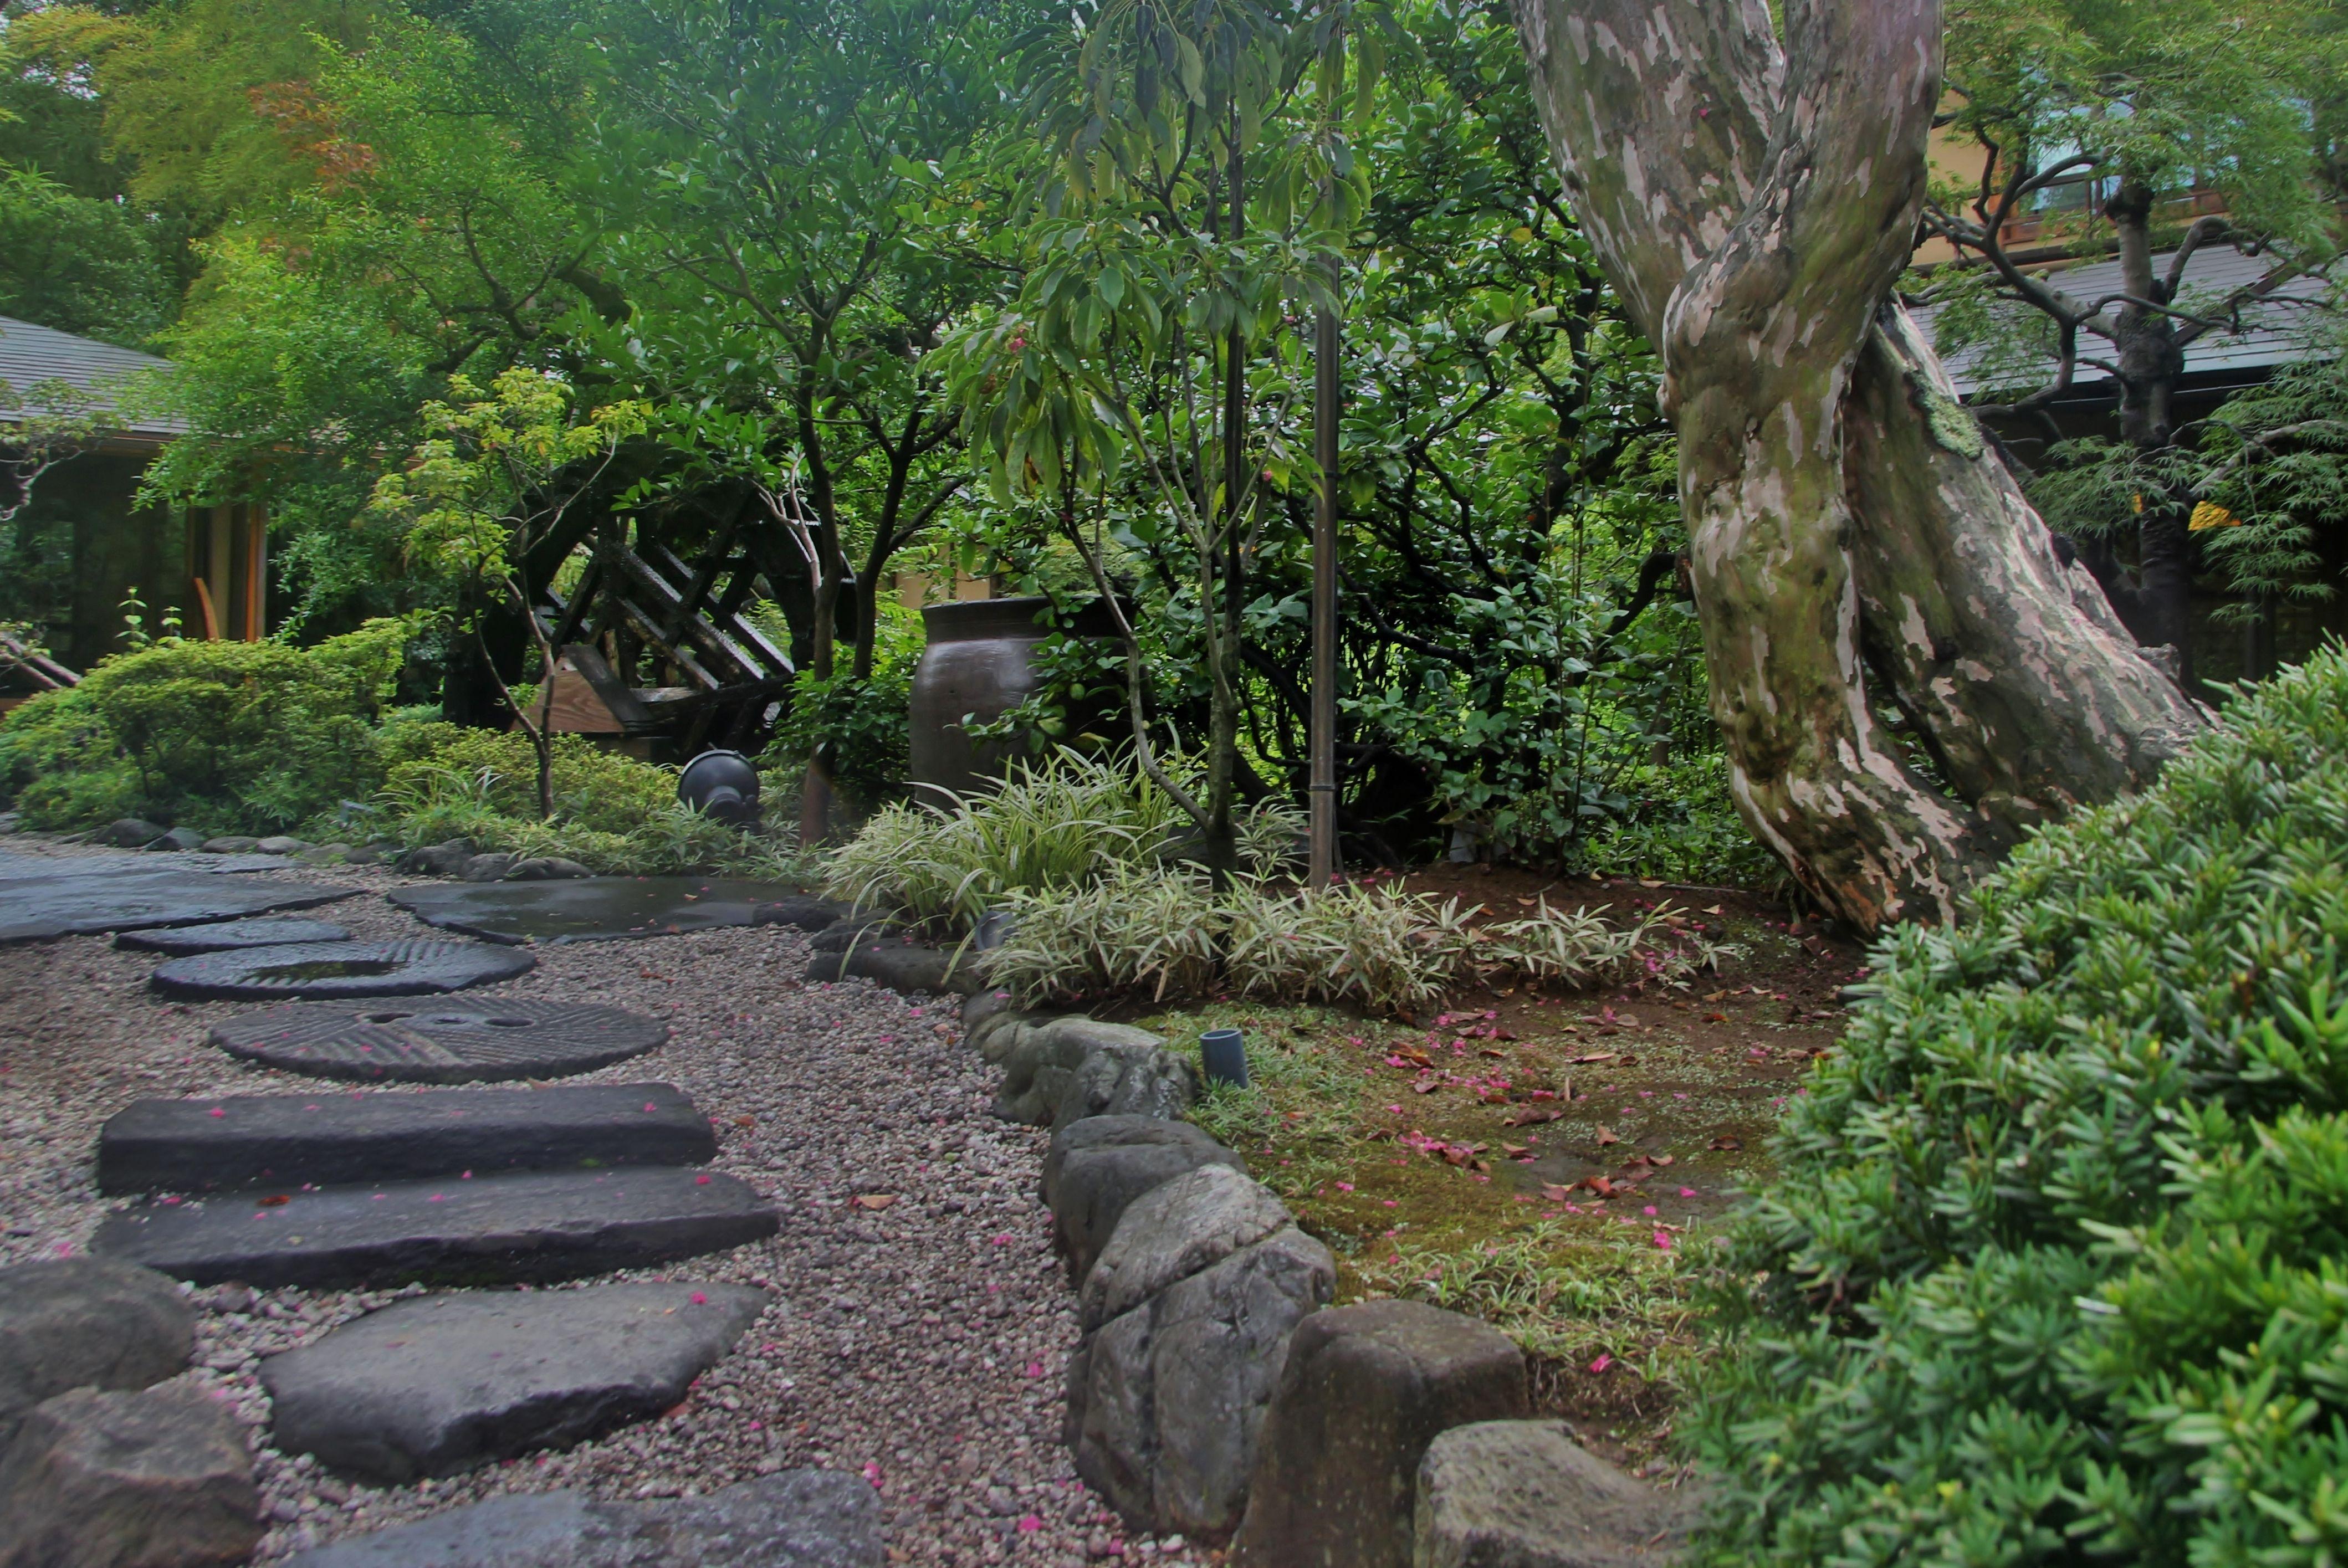 Building A Pebble Beach In A Garden Pond - Japanese